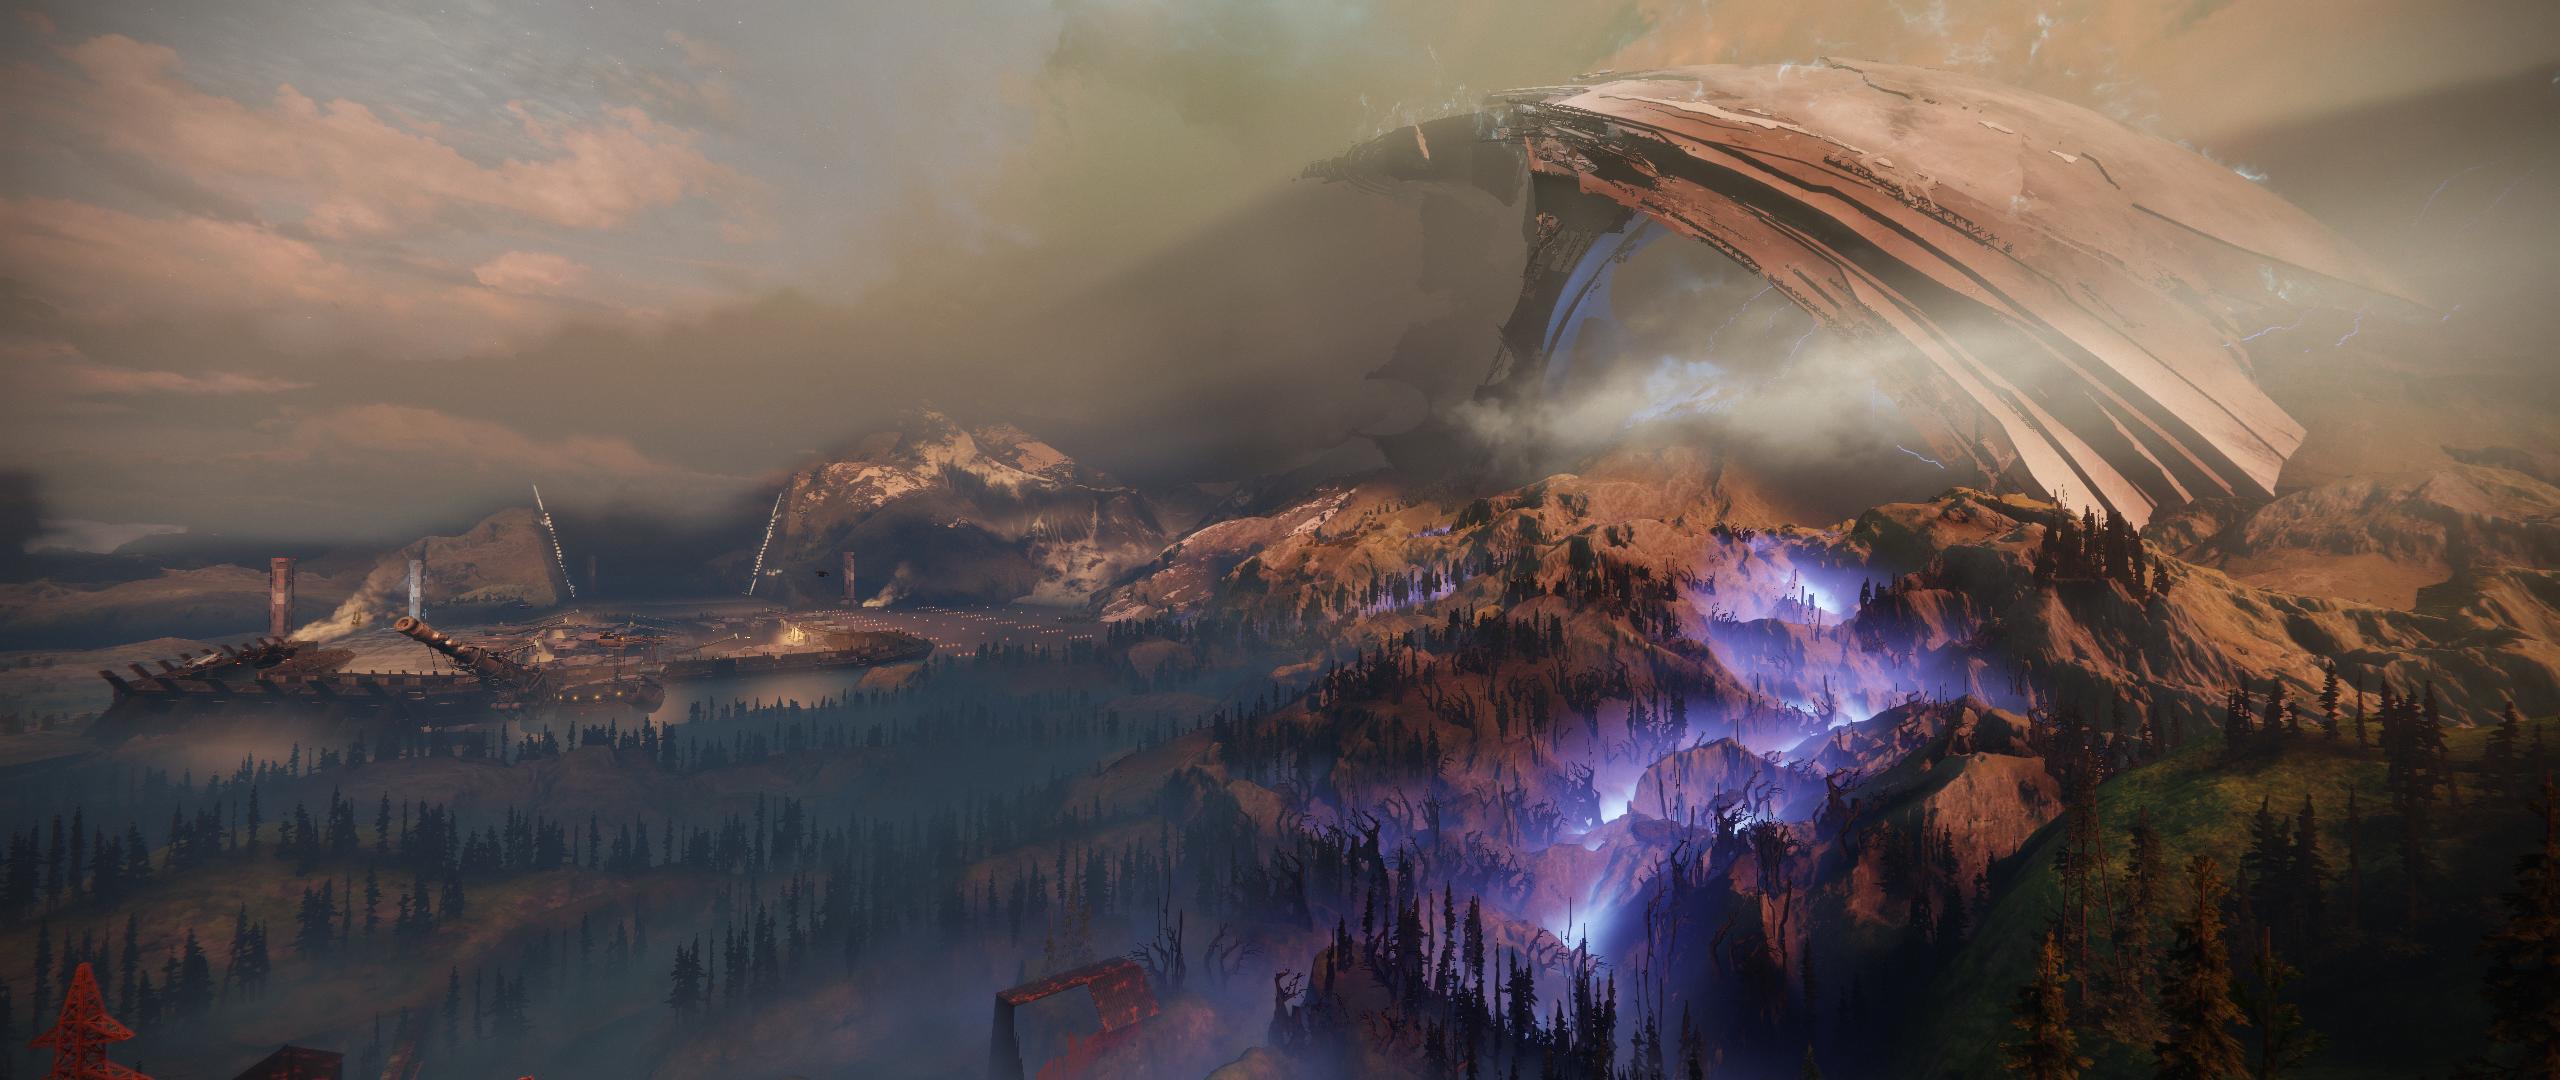 Destiny 2 Shard Of The Traveler Screenshot 2560x1080 Destiny Travel Hd Wallpaper